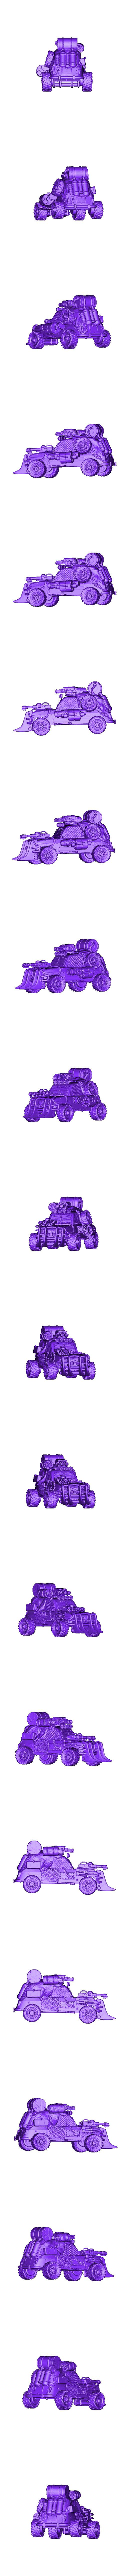 renanault4 was.OBJ Télécharger fichier OBJ renault 4 gaslands • Objet pour impression 3D, millercamel